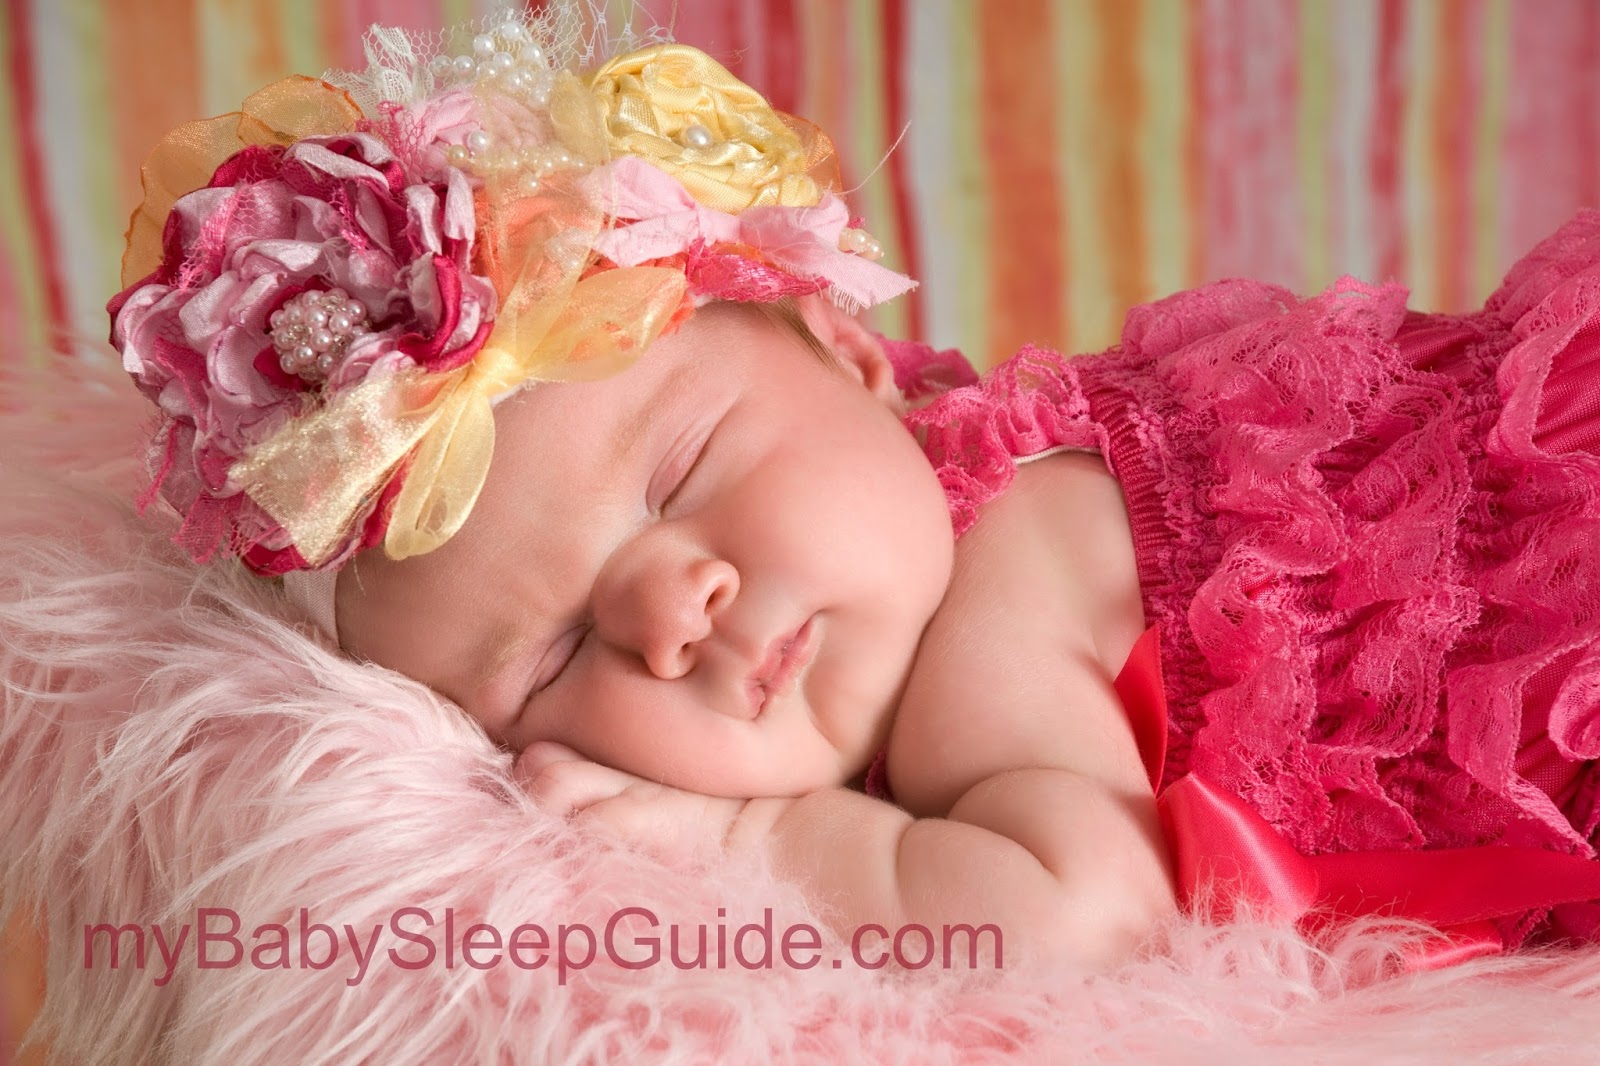 Newborn Sample Schedules ~ My Baby Sleep Guide   Your sleep problems